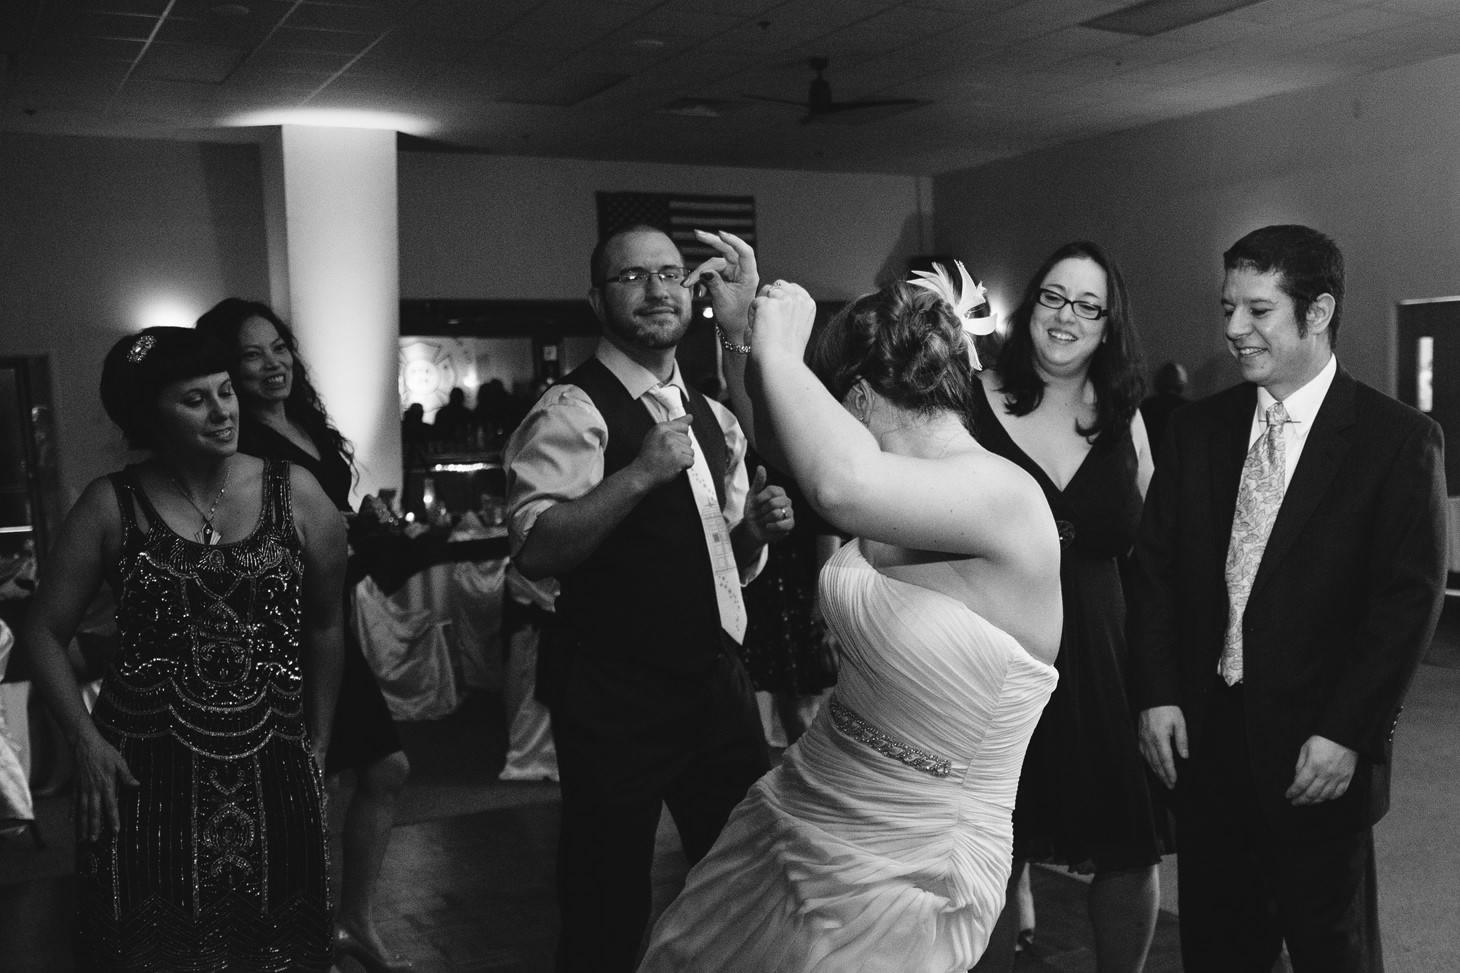 048-nyc-wedding-photographer-nj-nerdy-dr-who-firehouse-wedding-smitten-chickens.jpg